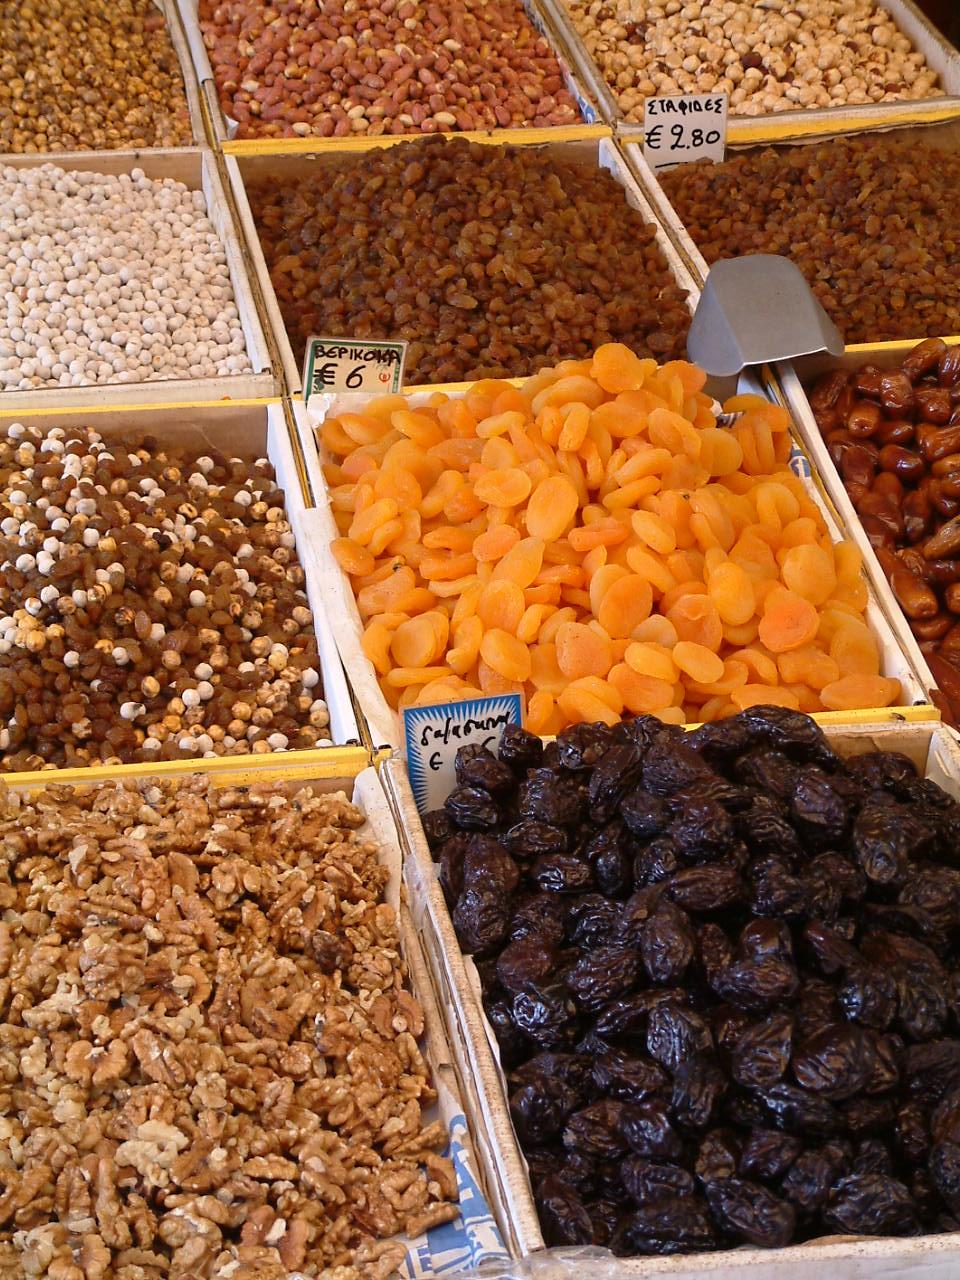 http://upload.wikimedia.org/wikipedia/commons/d/dd/Dry_fruits.jpg